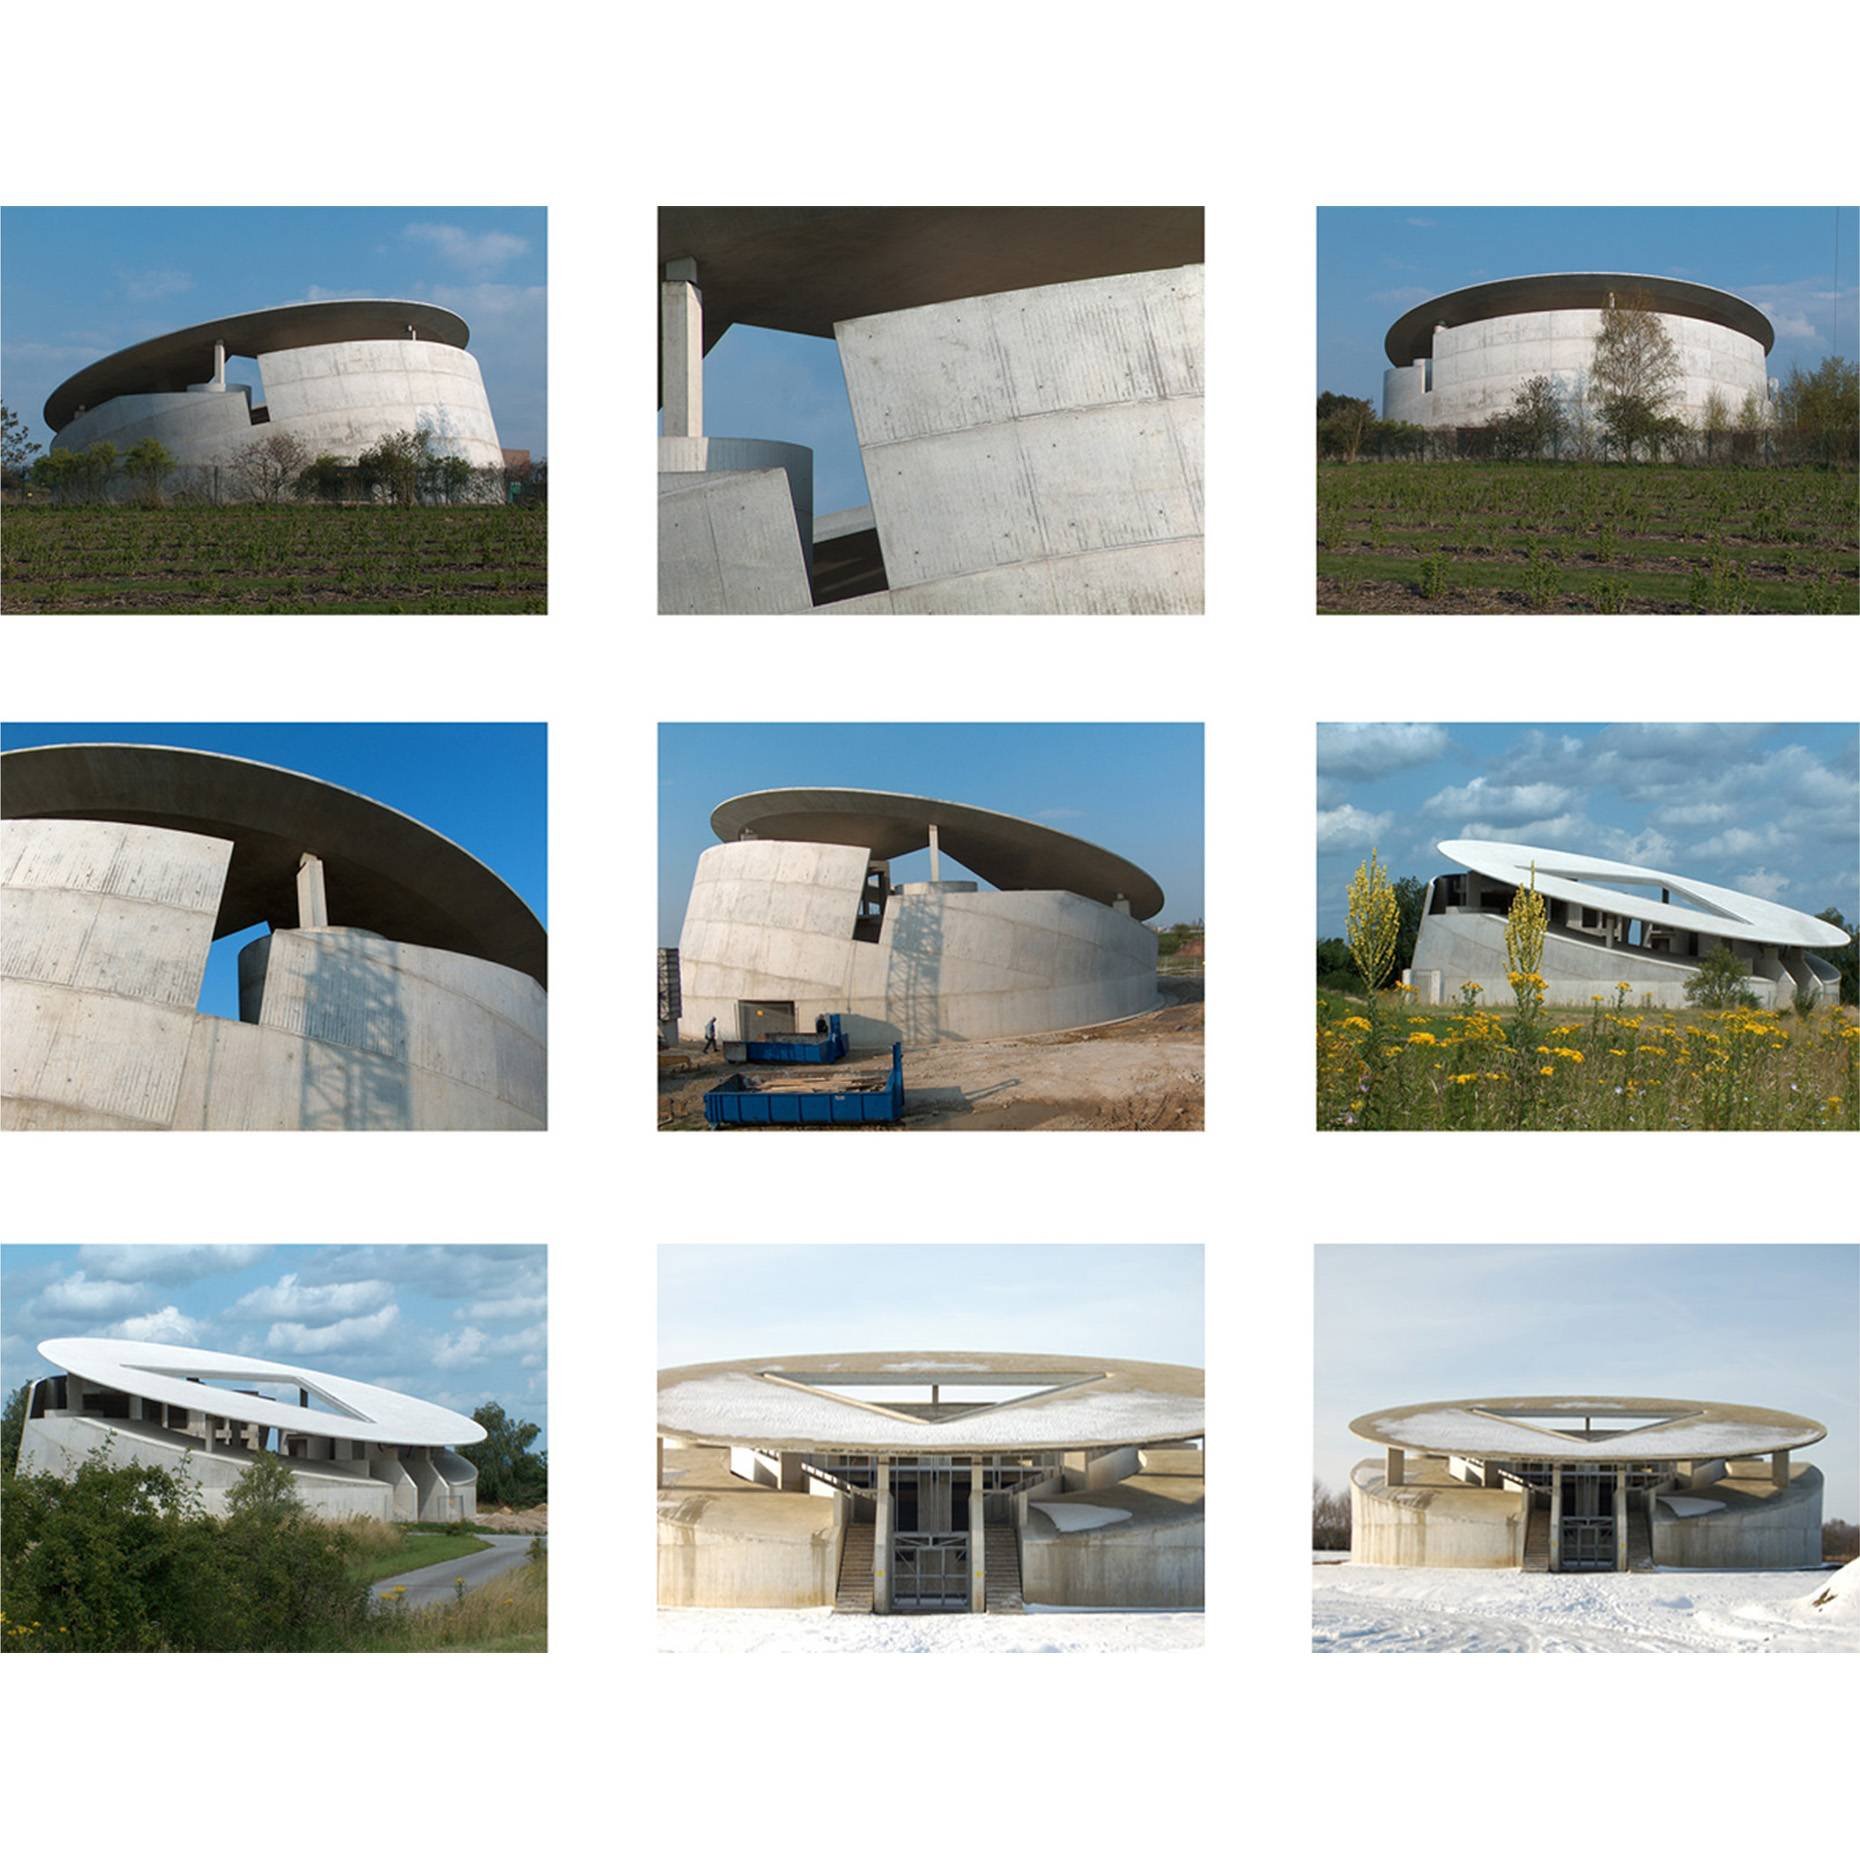 Haus für Musiker 2010 9 tlg. Seq. Ultrachrome K3 Tinte a/Canson Infinity 210g/qm je Din A3